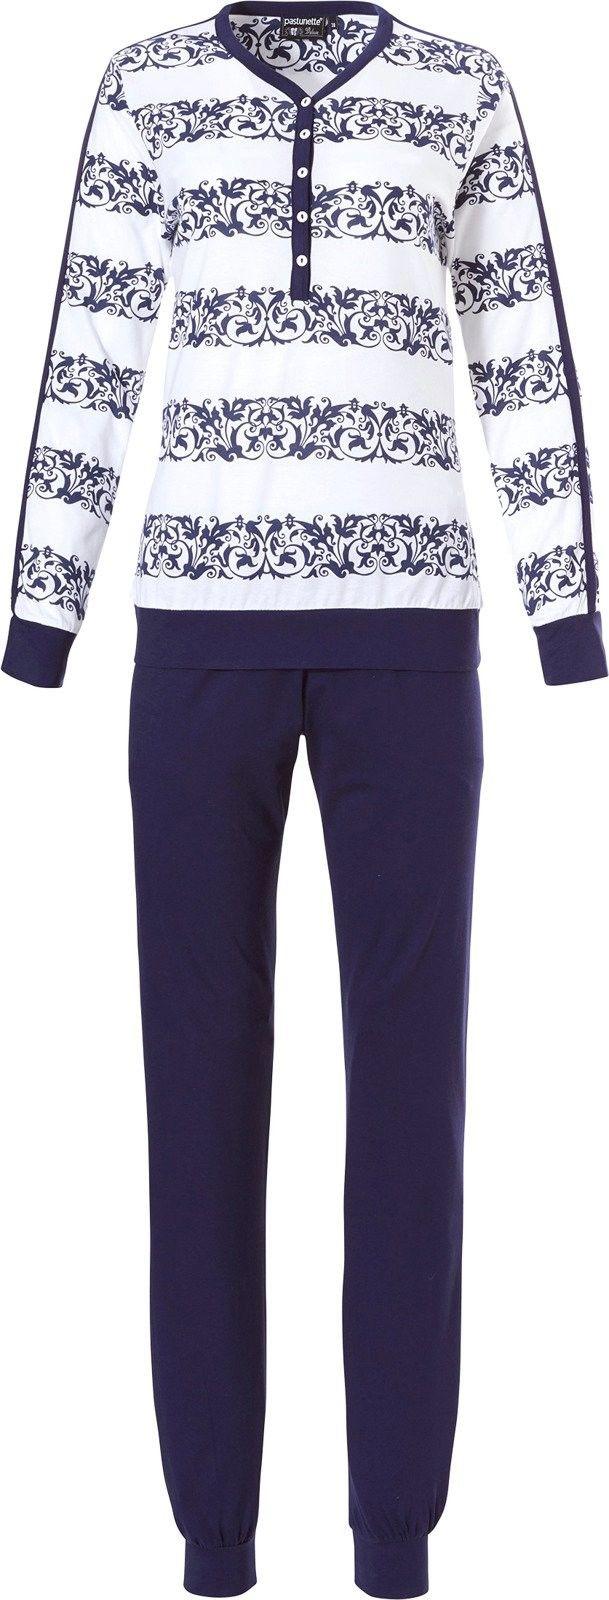 Piżama Pastunette Gingham 25192-320-4 kolor 526